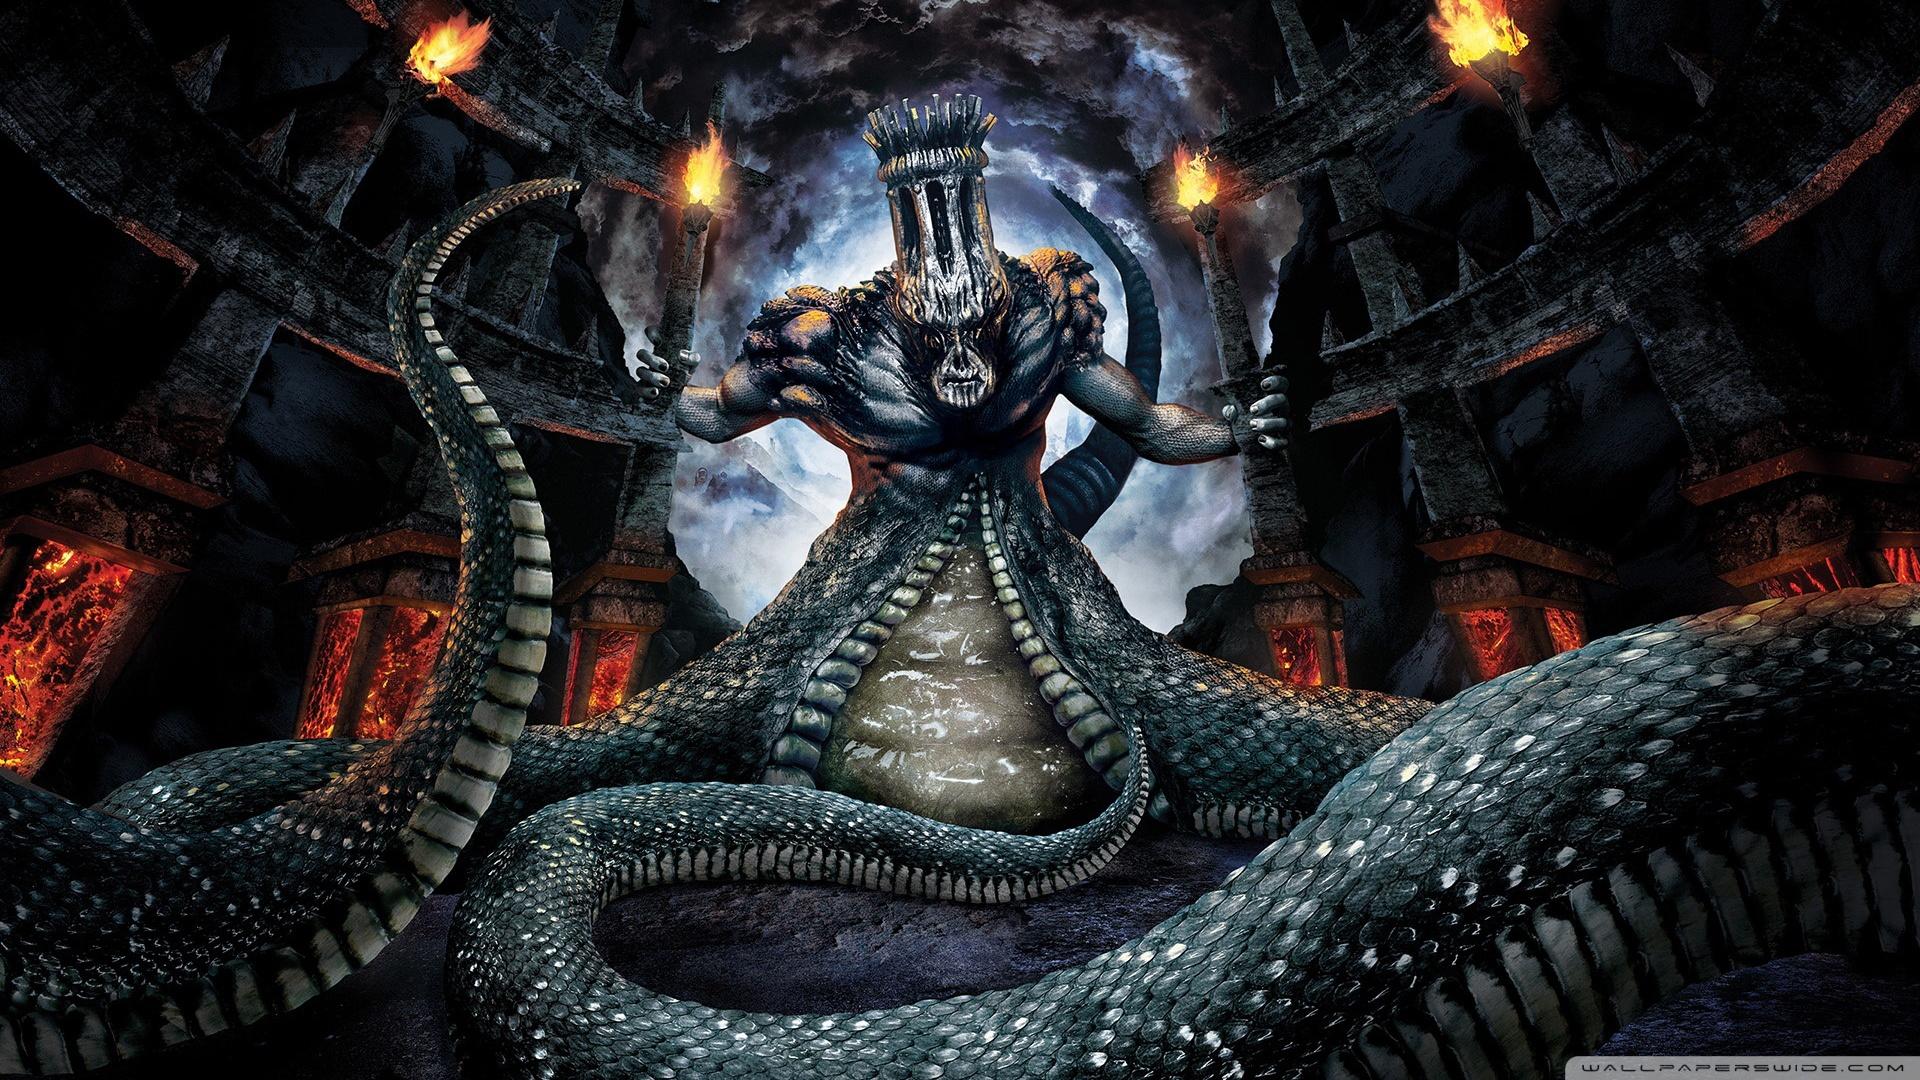 Imagini Dantes Inferno dantes hd wallpaper Wallpapereorg 1920x1080